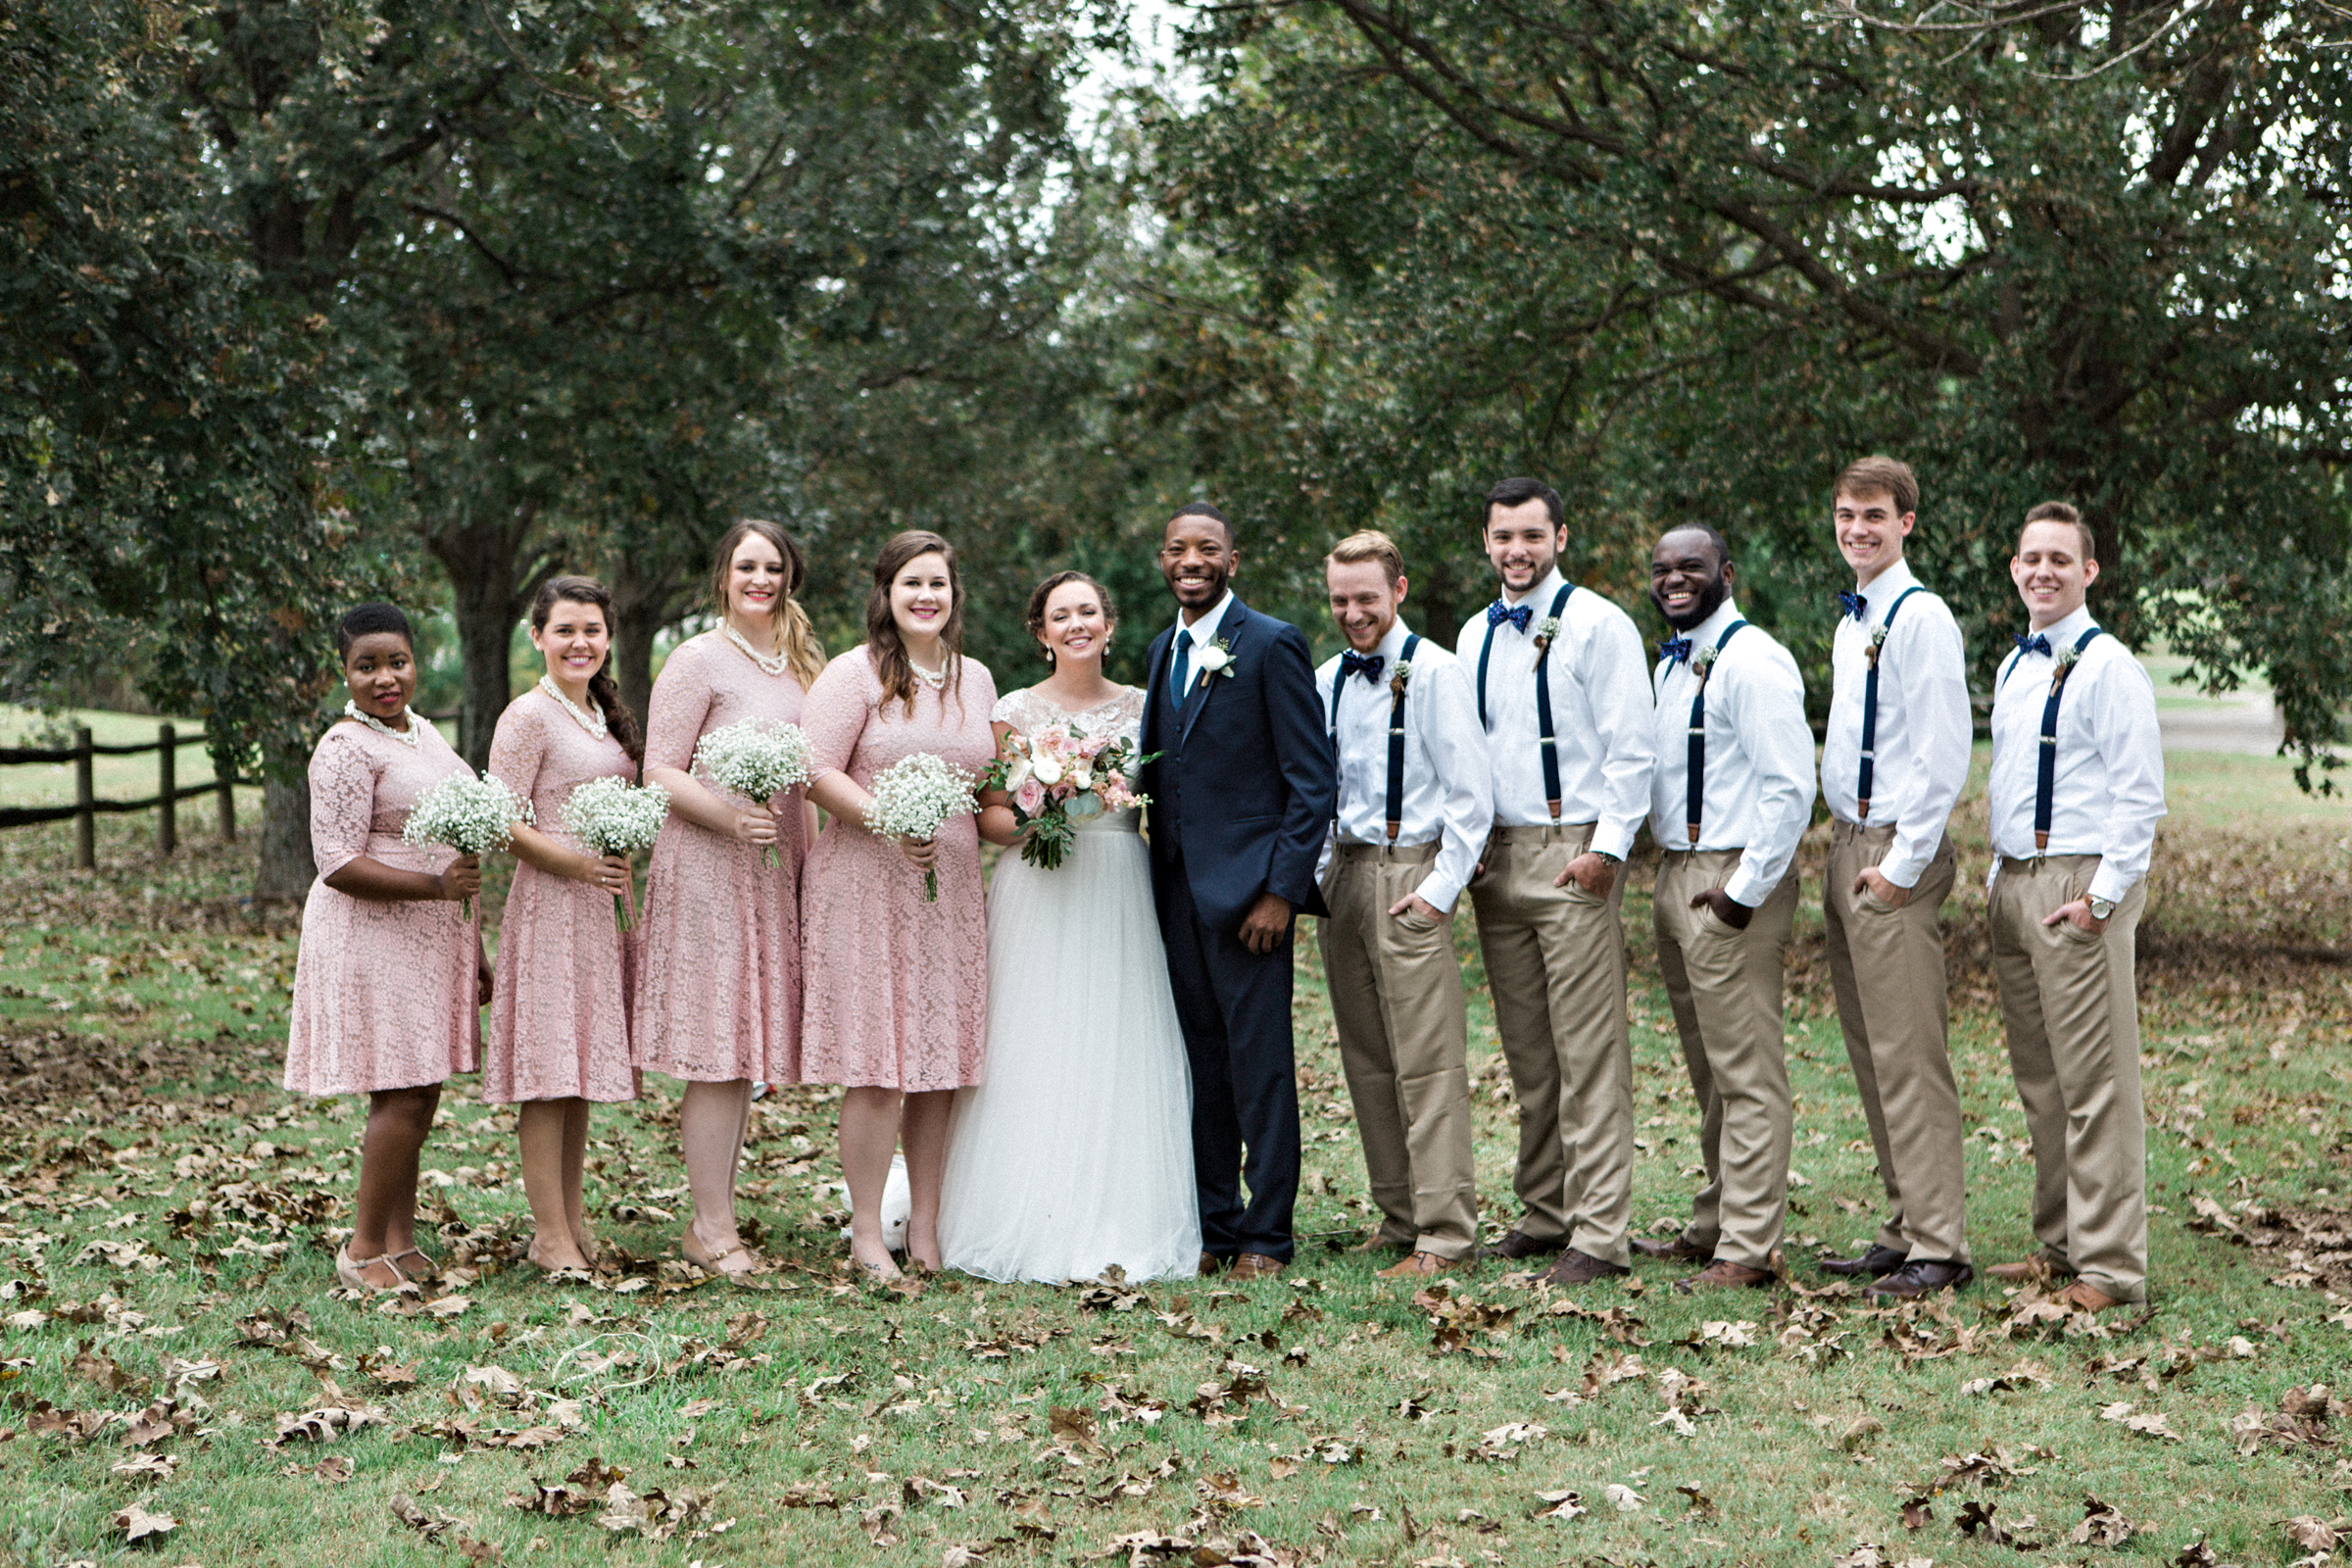 Alabama-Wedding-Photography-Nick-Drollette-Cory-Laura-137.jpg